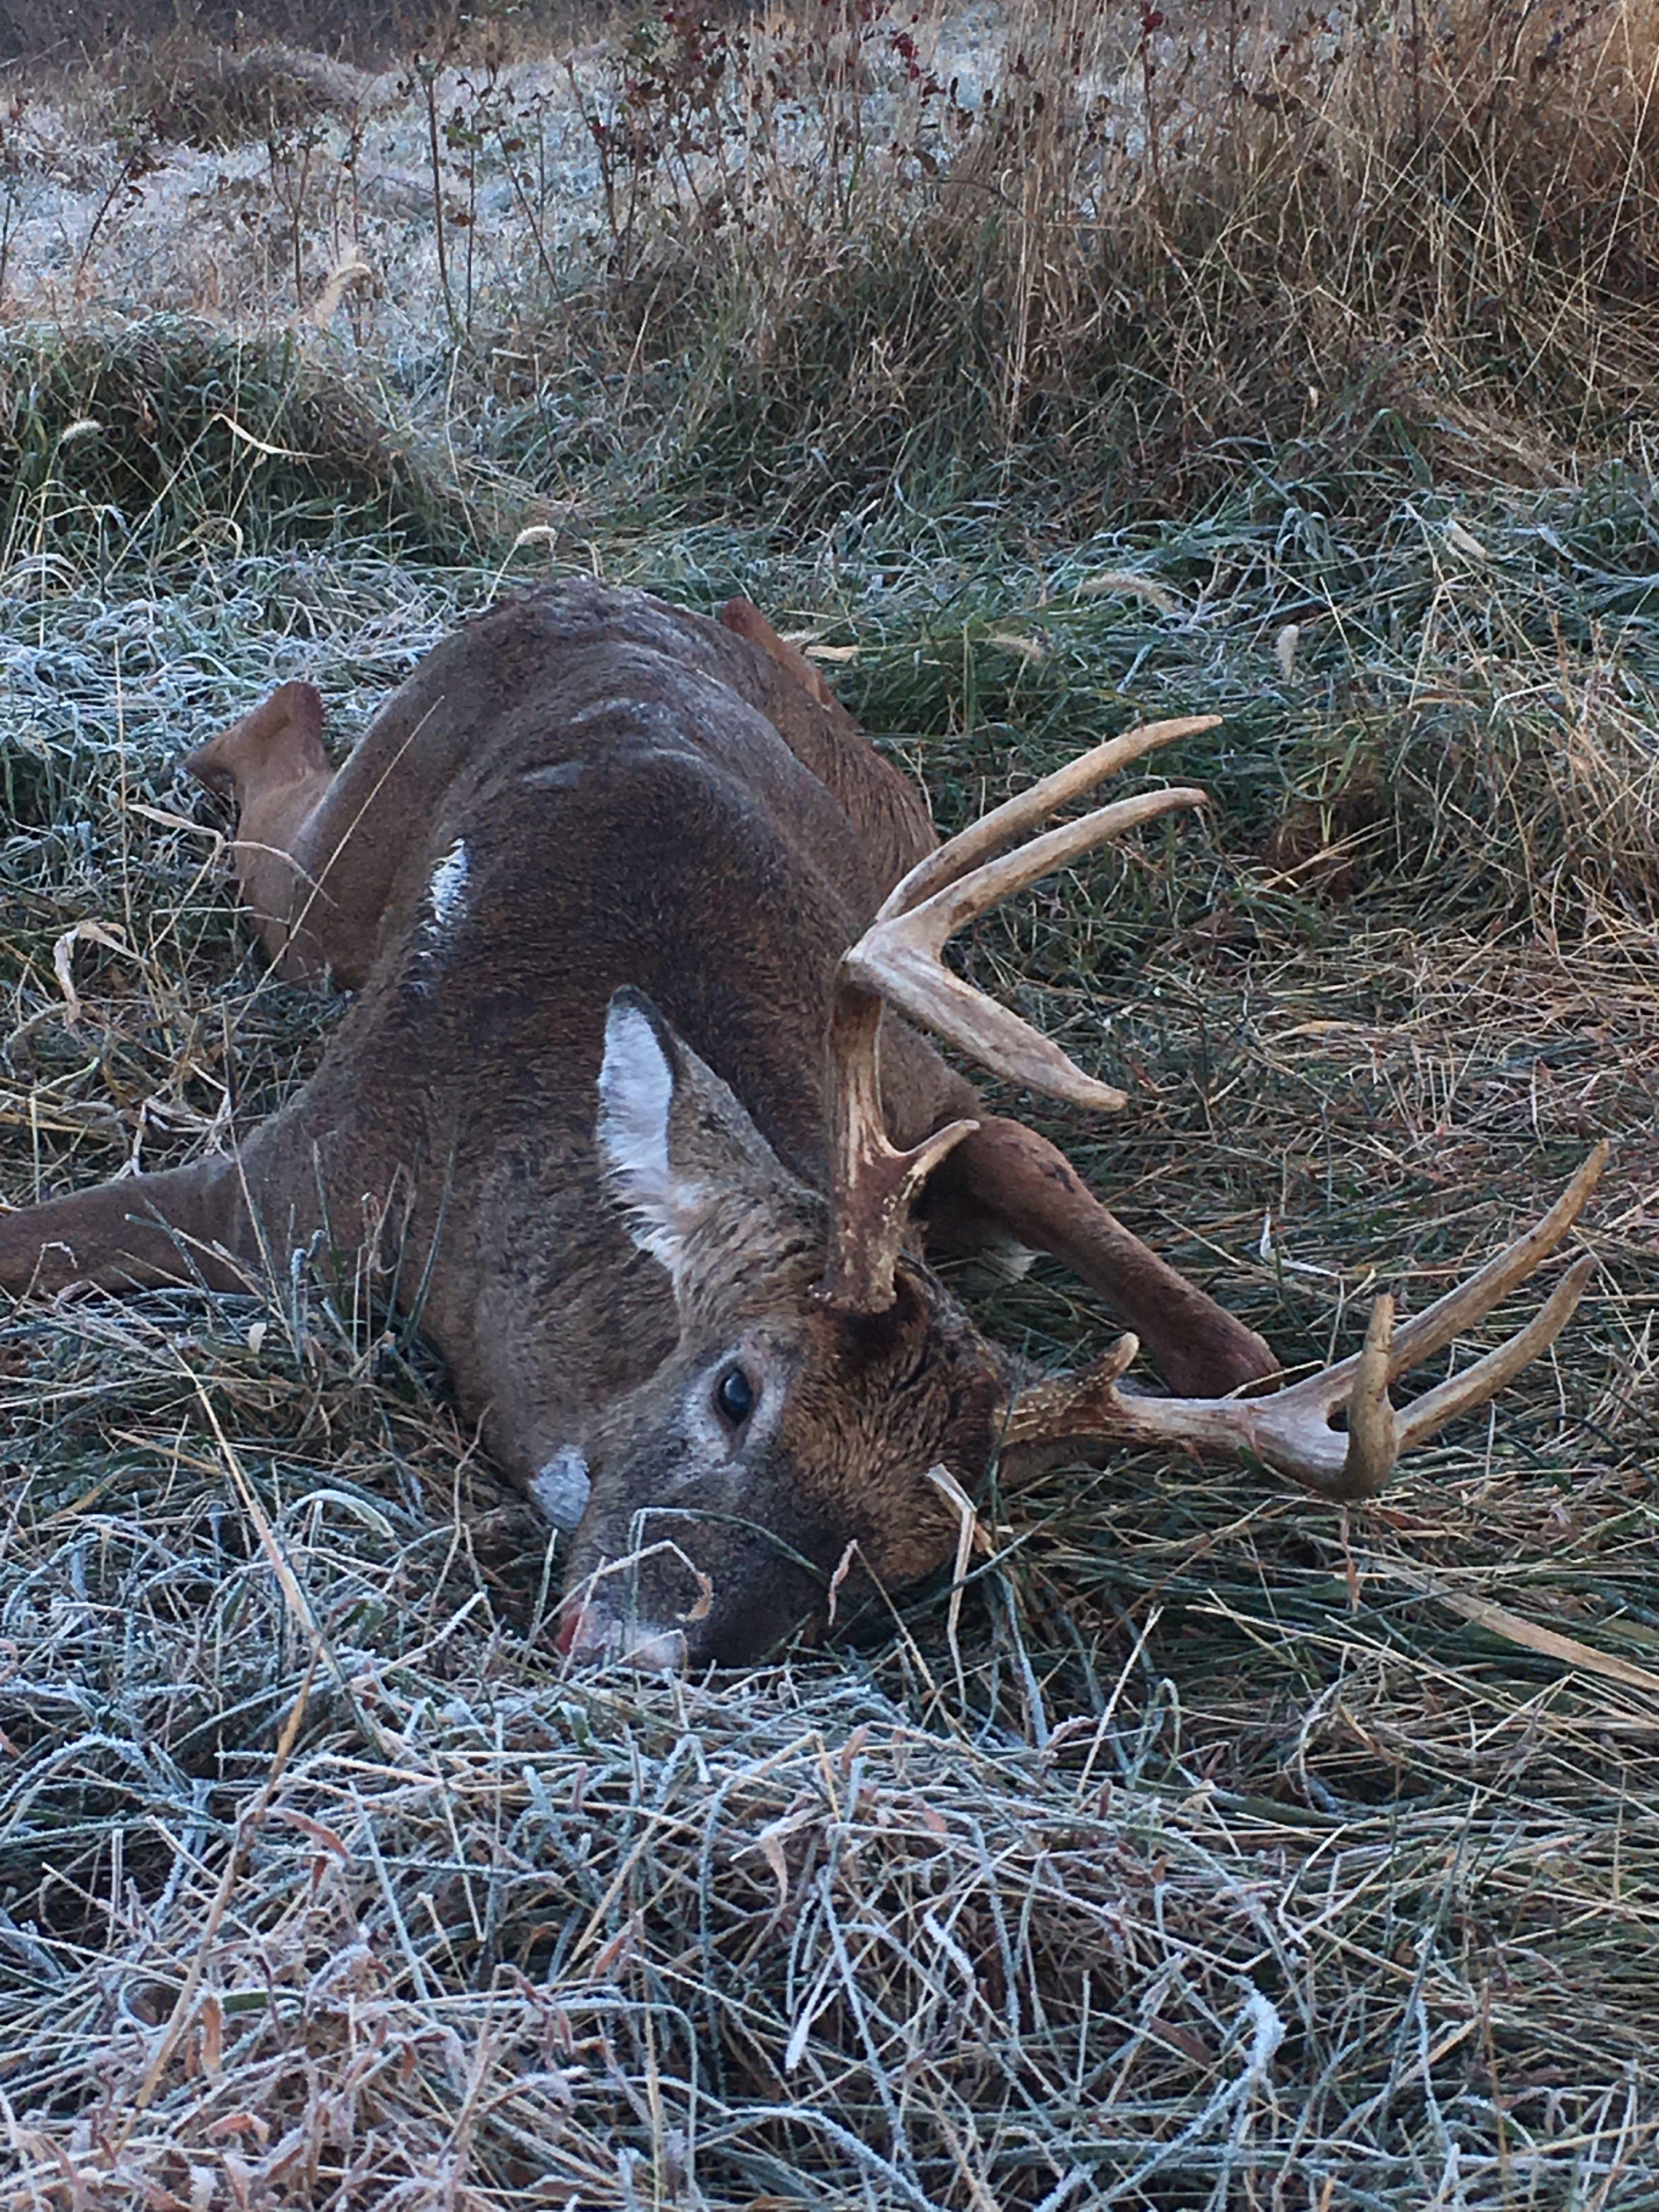 My Hunting & Fishing image by Adam Deer hunting